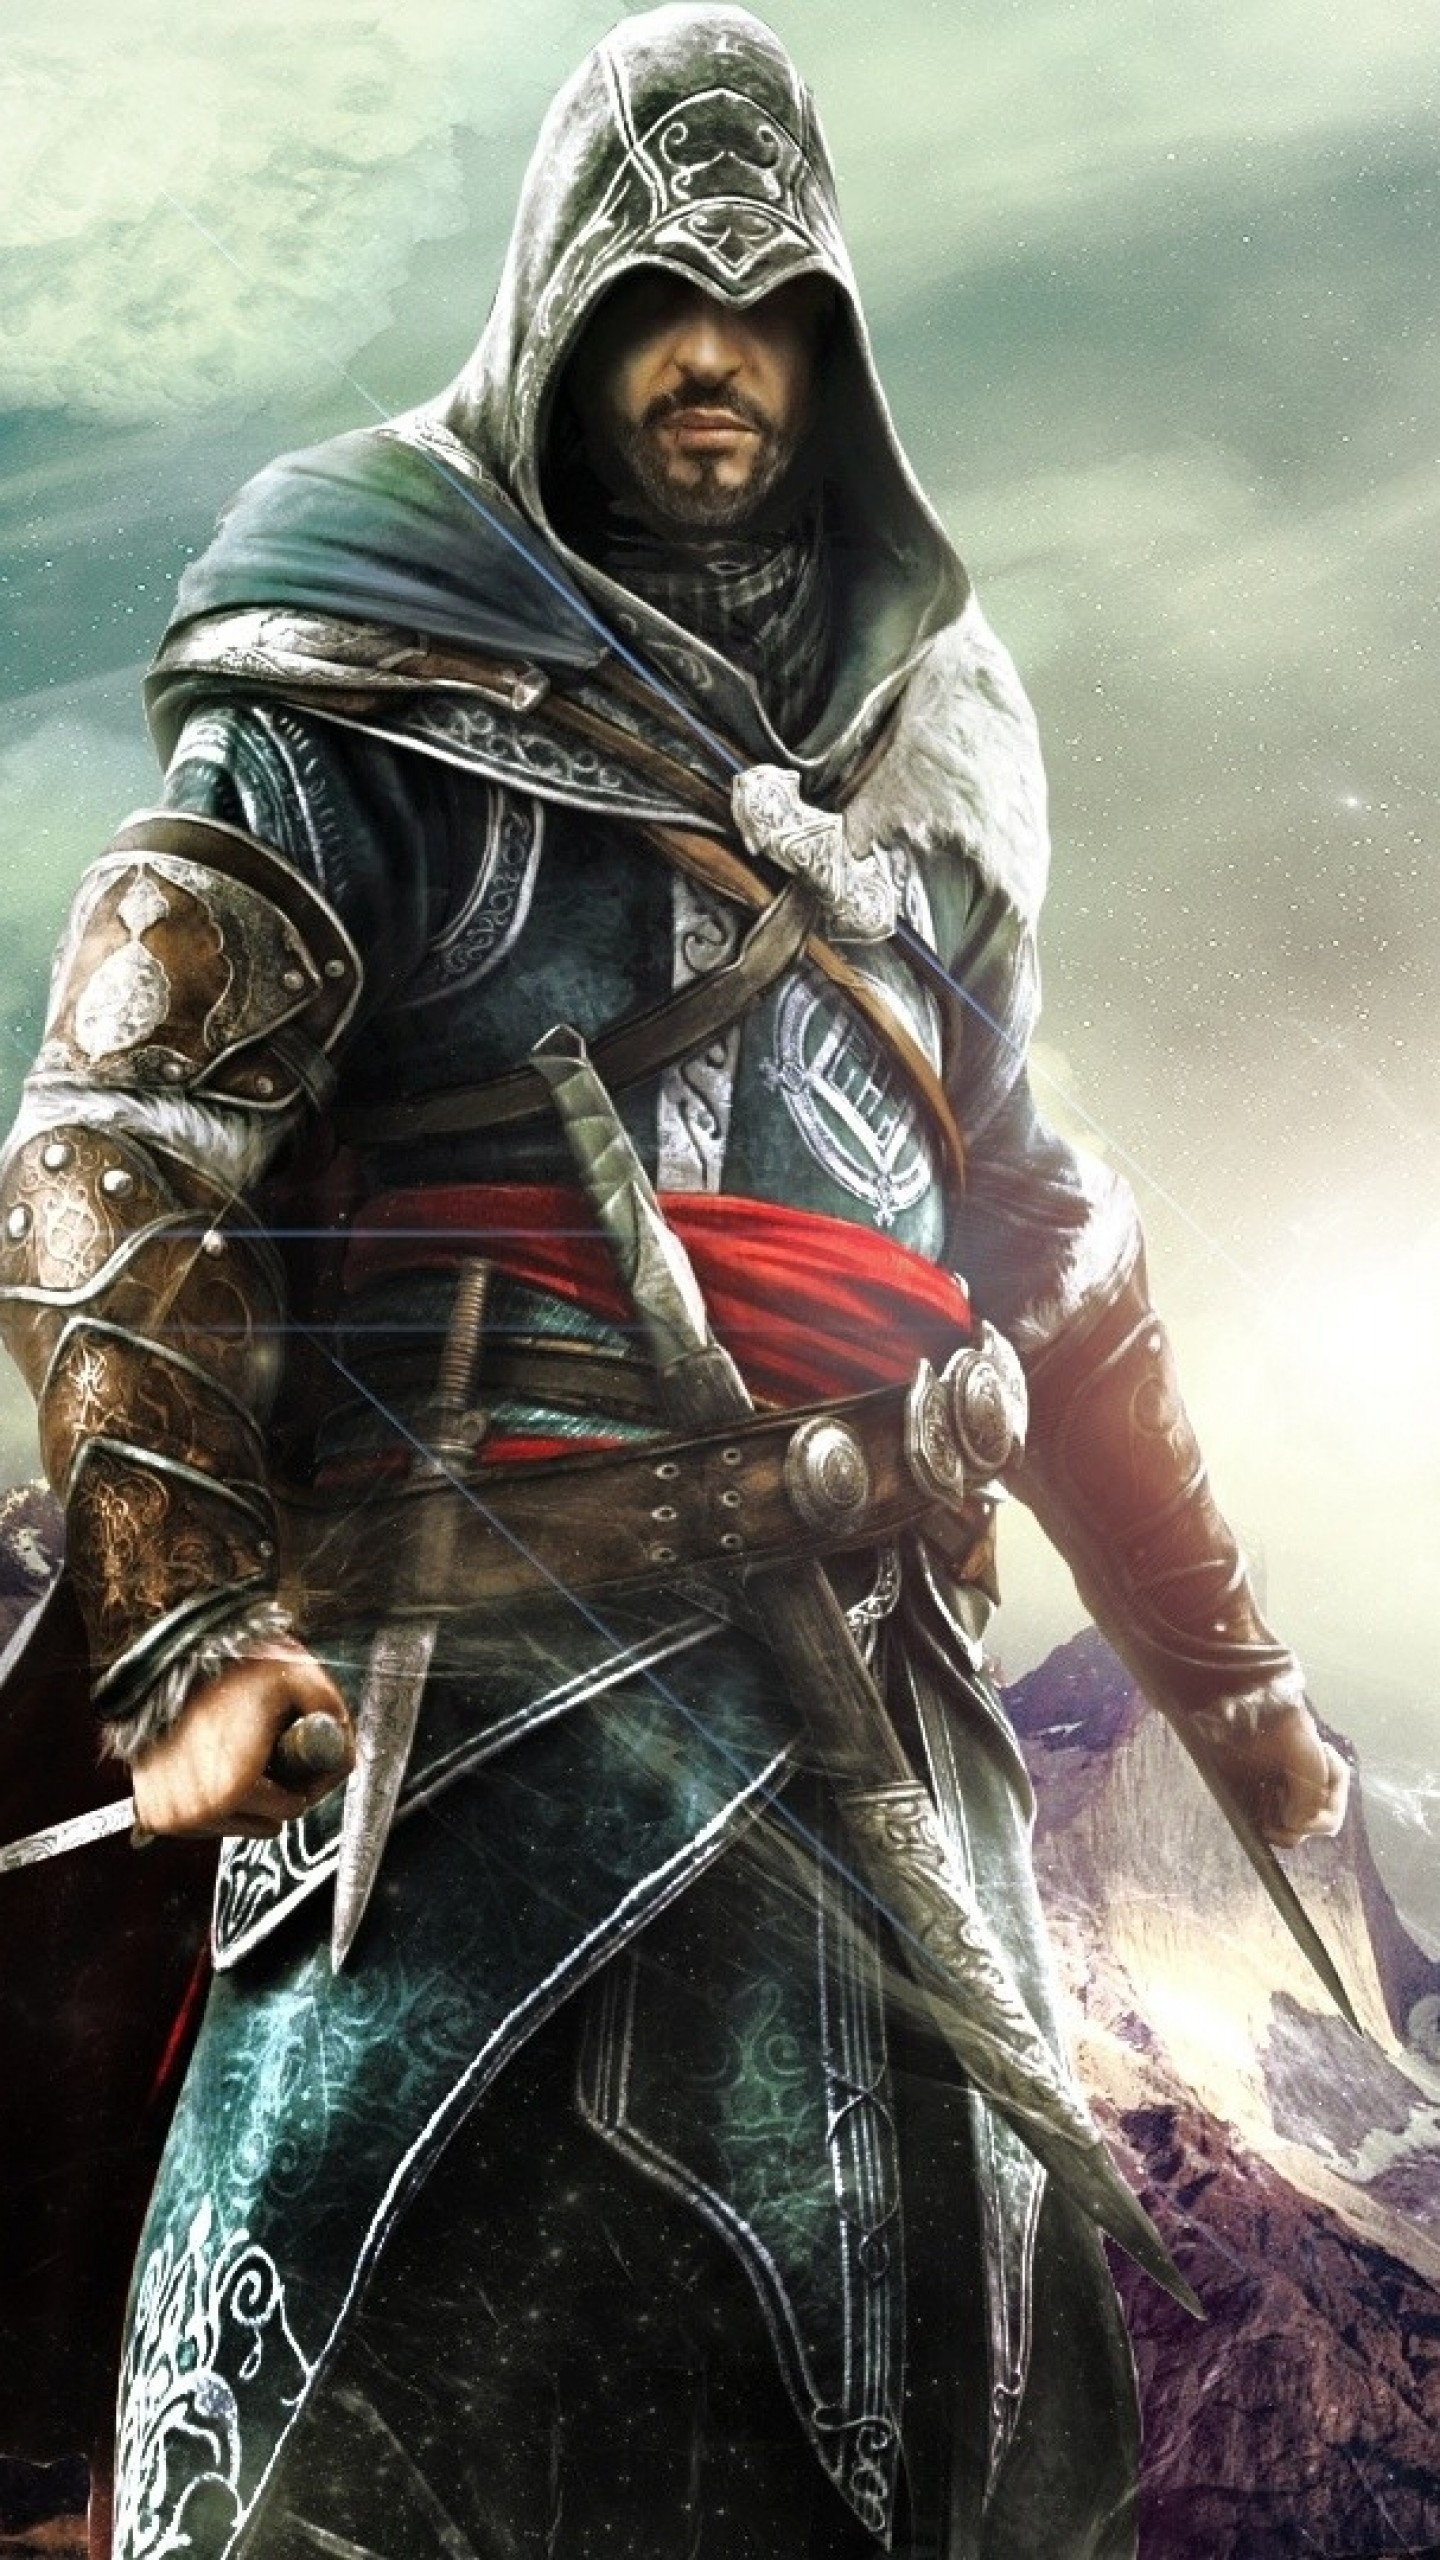 Wallpaper assassins creed revelations, desmond miles, hood,  knife, mountains